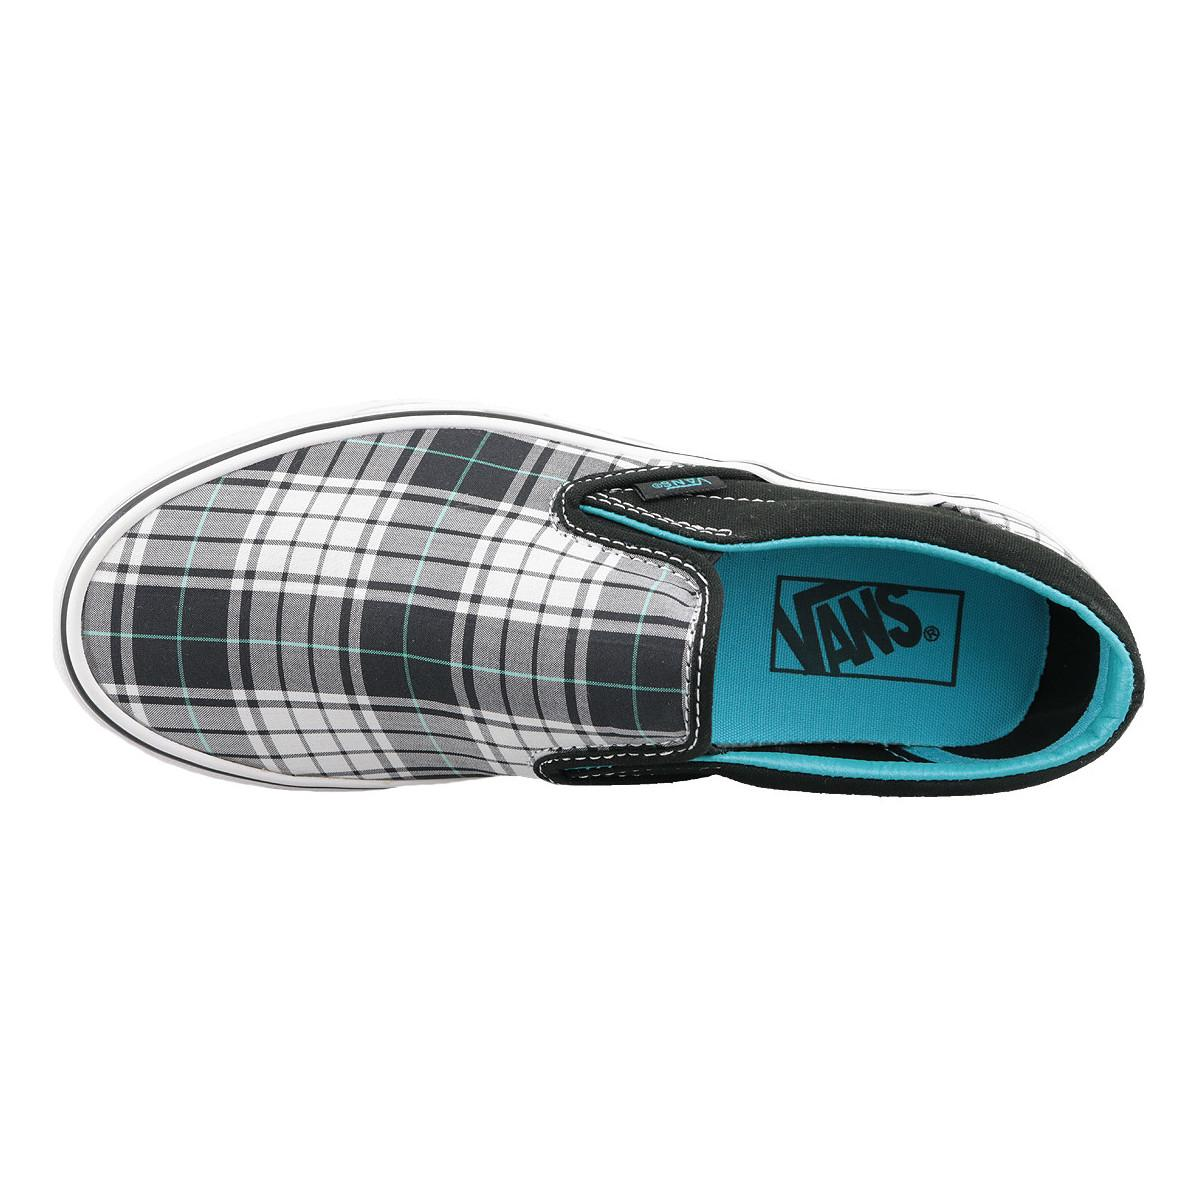 Classic Slip-On VN0LYFL6W Chaussures Vans en coloris Bleu